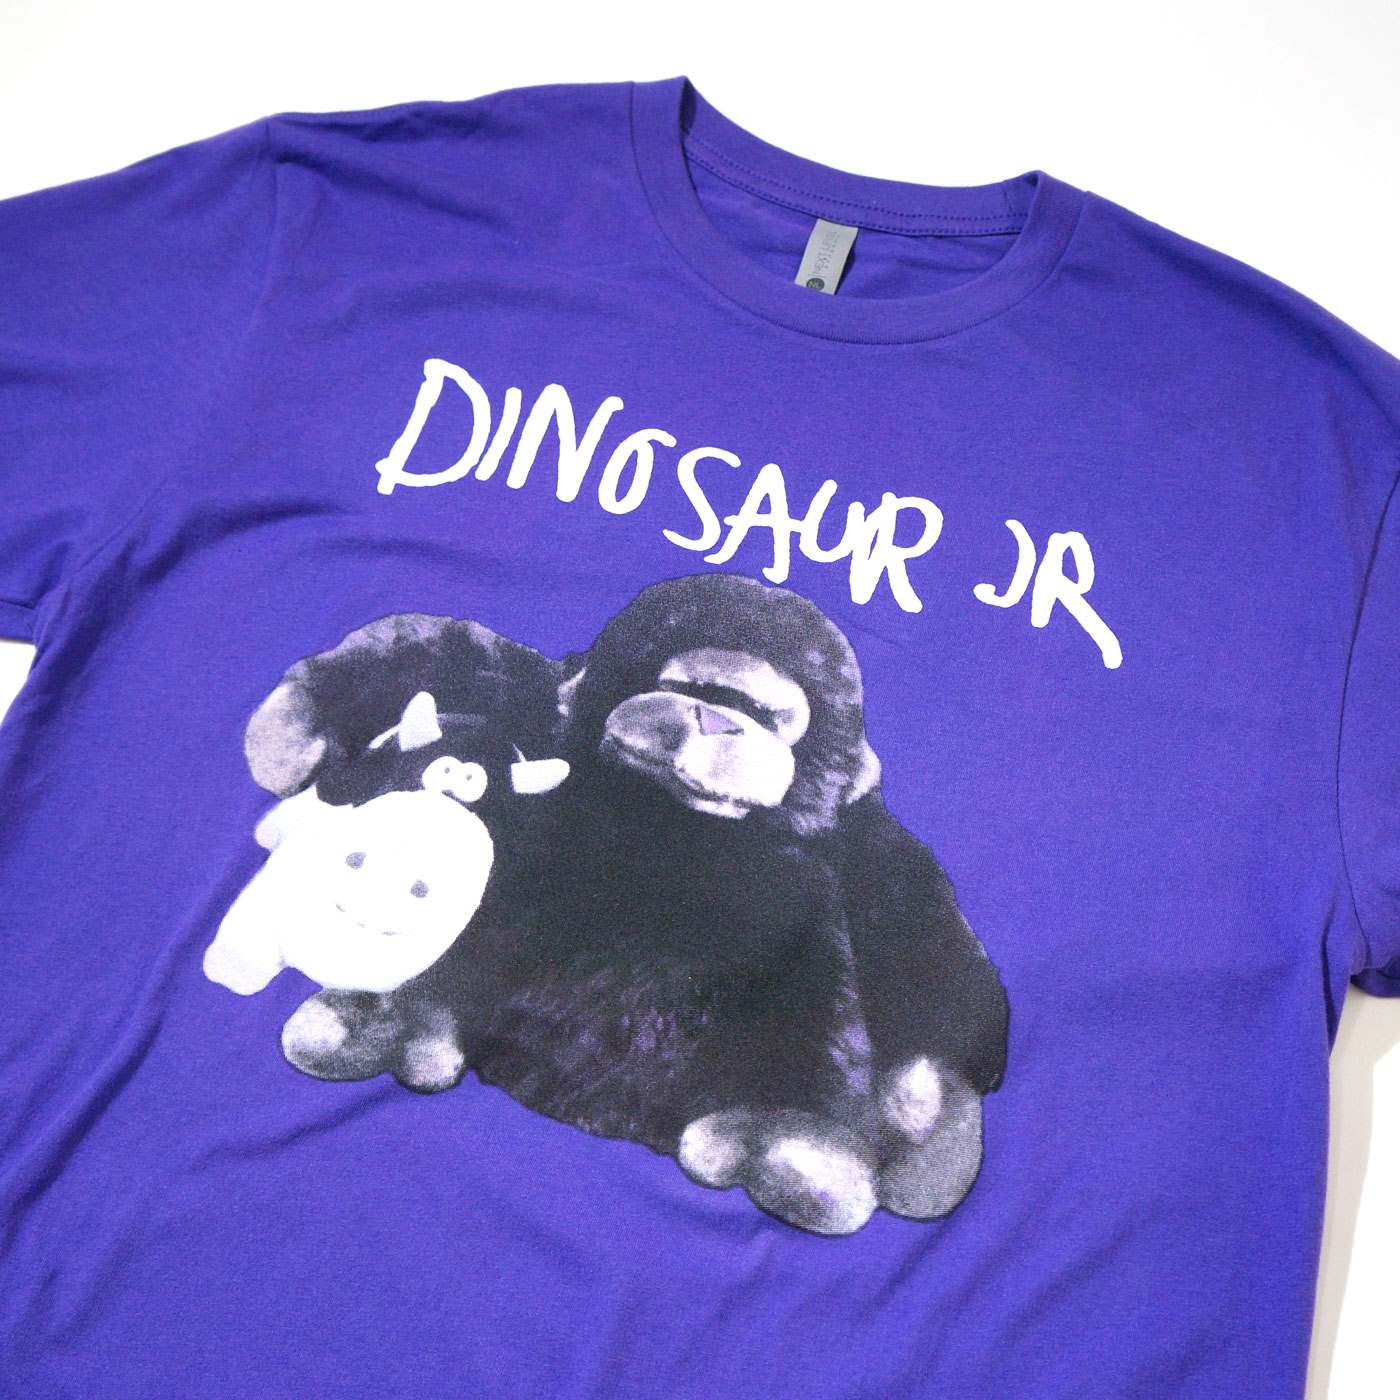 DINOSAUR Jr. Tシャツ Wagon-Purple